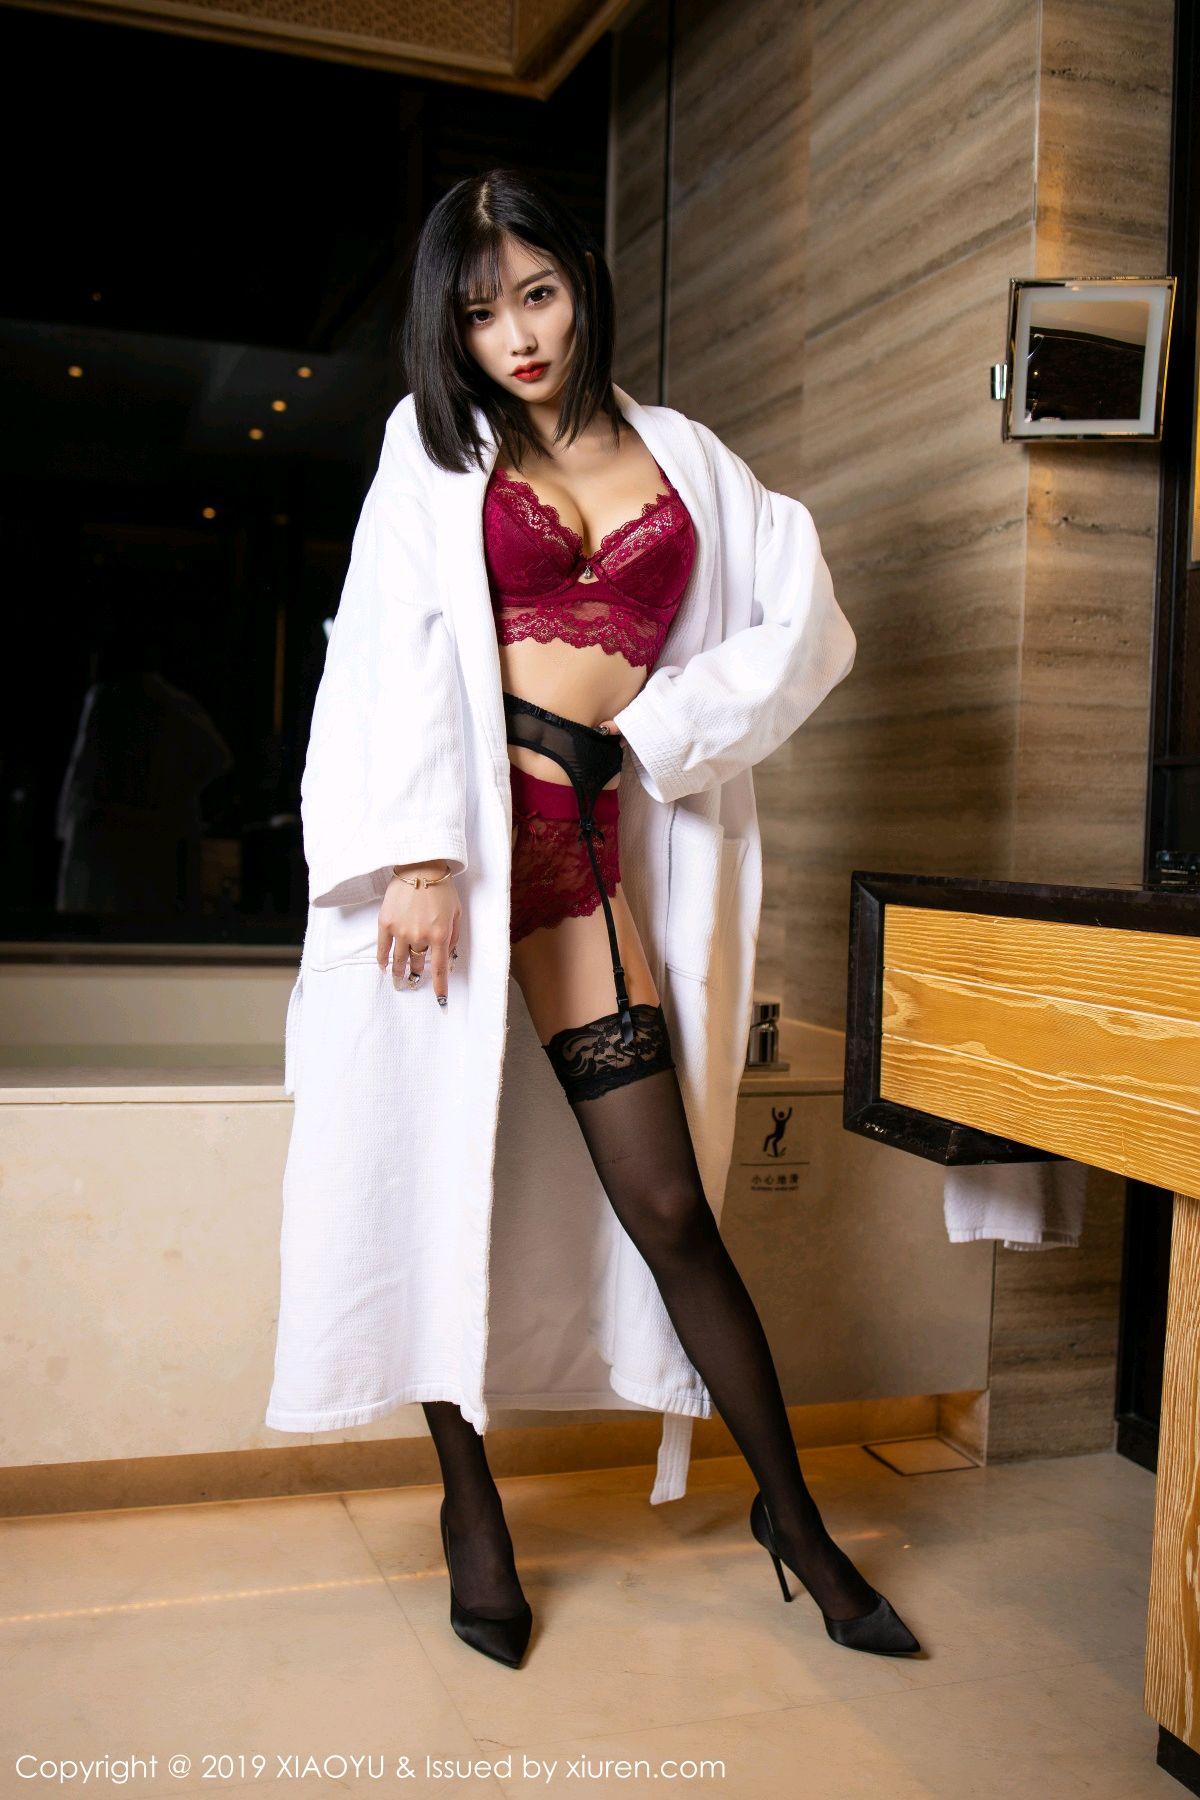 [XiaoYu] Vol.153 Yang Chen Chen 14P, Bathroom, Black Silk, Underwear, XiaoYu, Yang Chen Chen